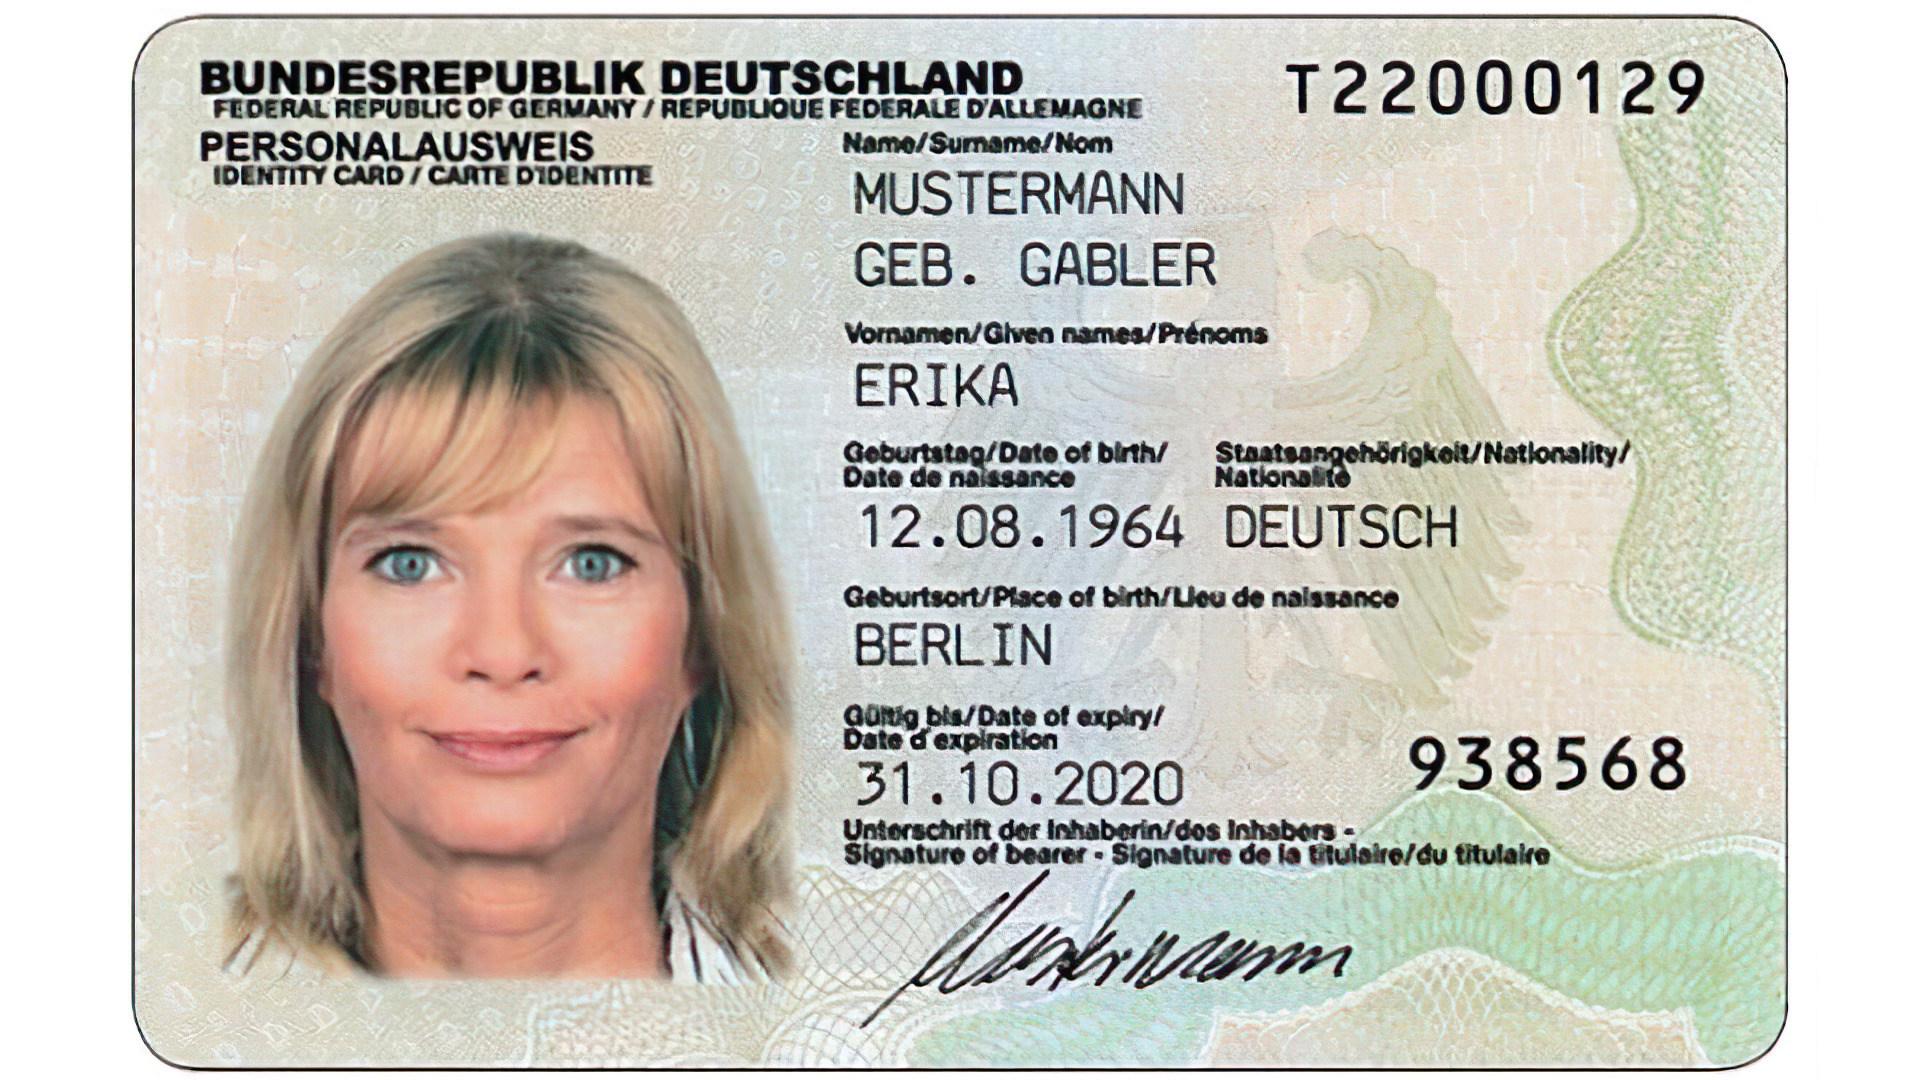 Deutschland, Personalausweis, id